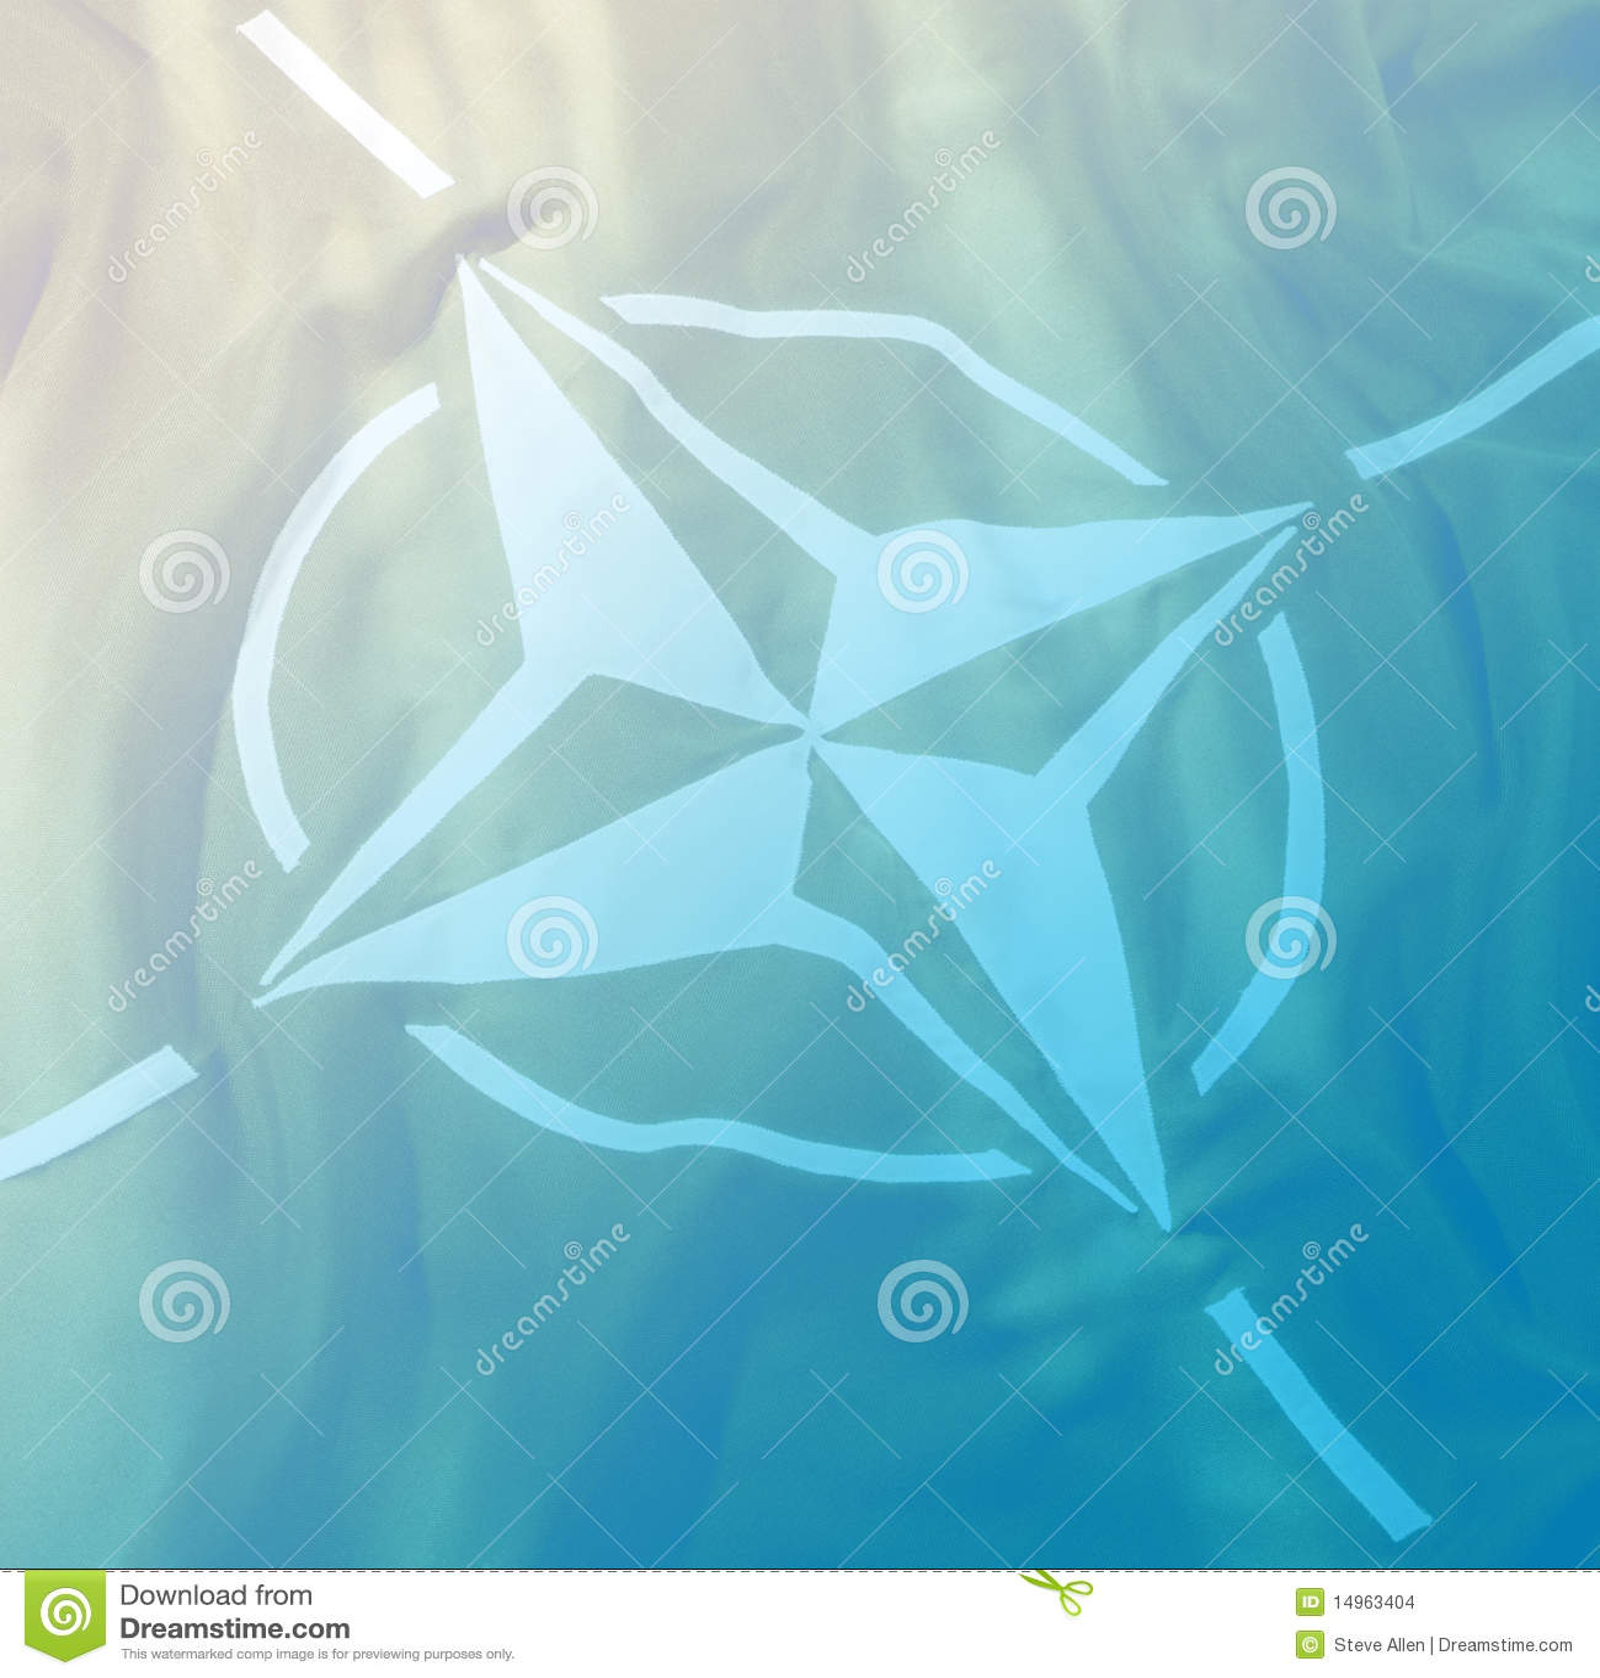 nato symbol stock images image 14963404